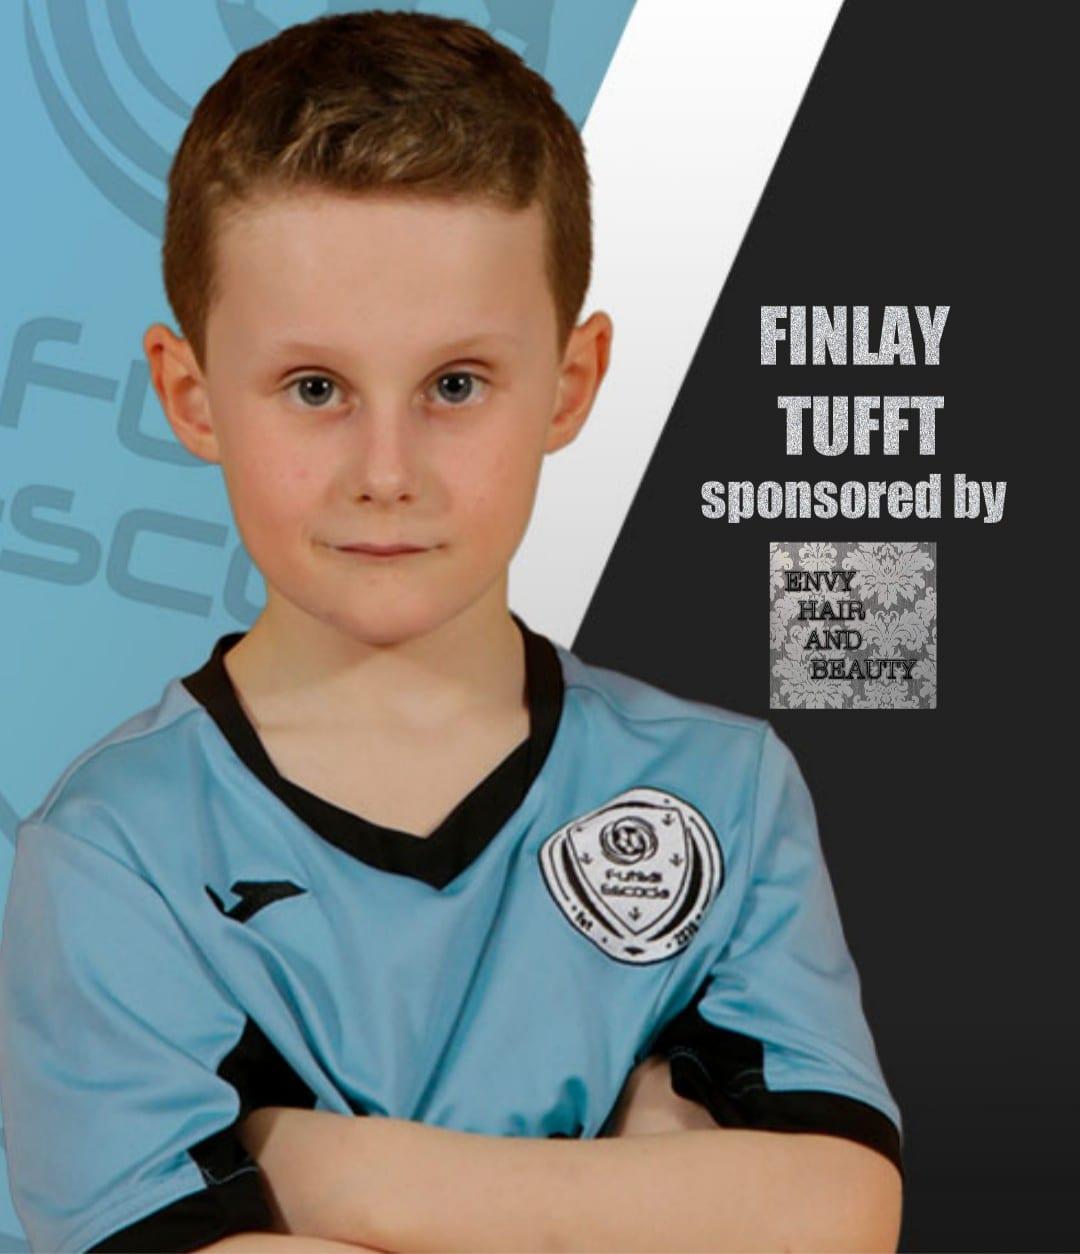 Finlay Tufft